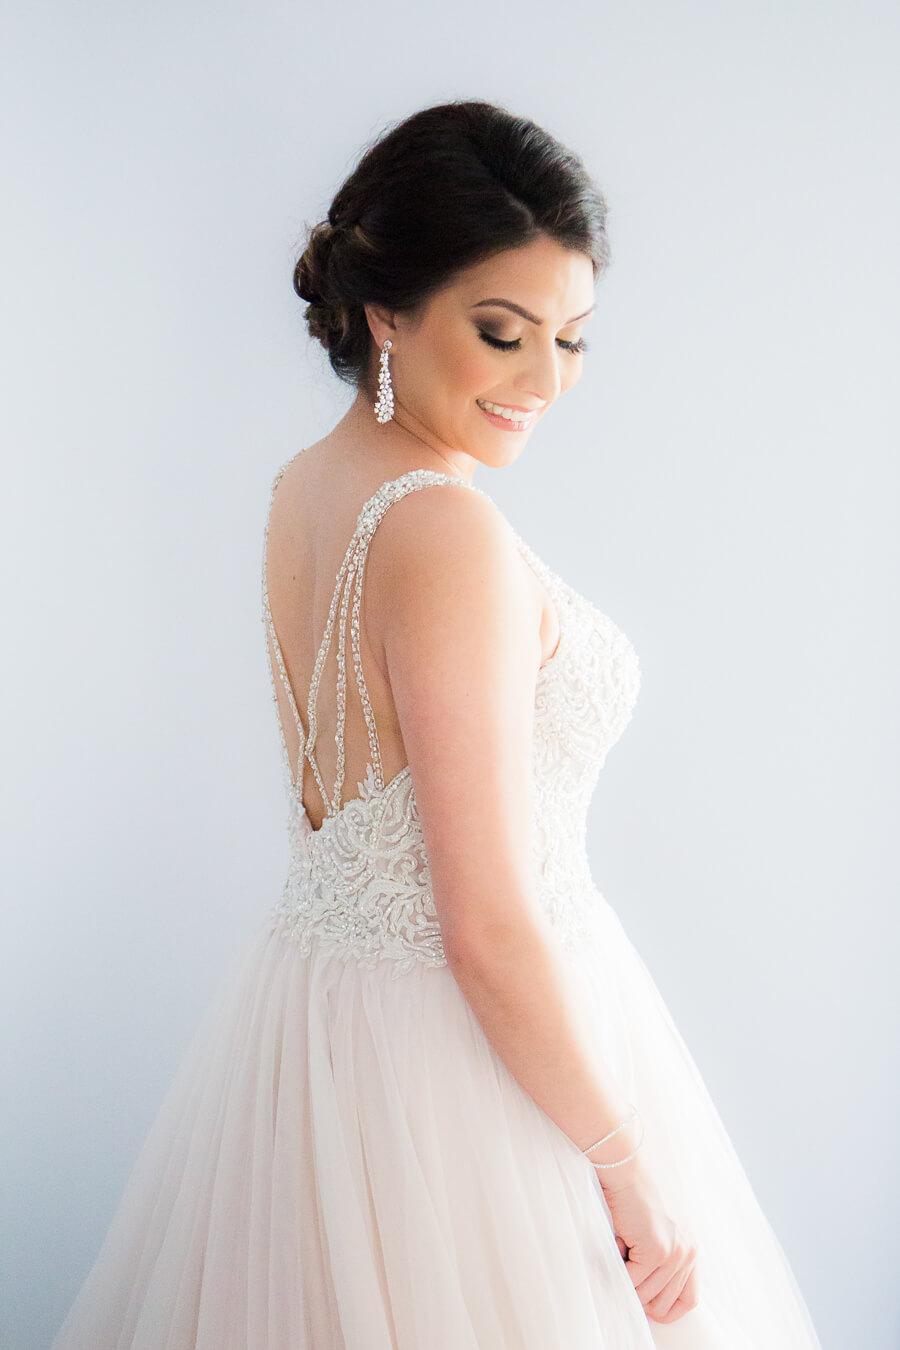 Houston Wedding Photographer - Jessica Pledger Photography